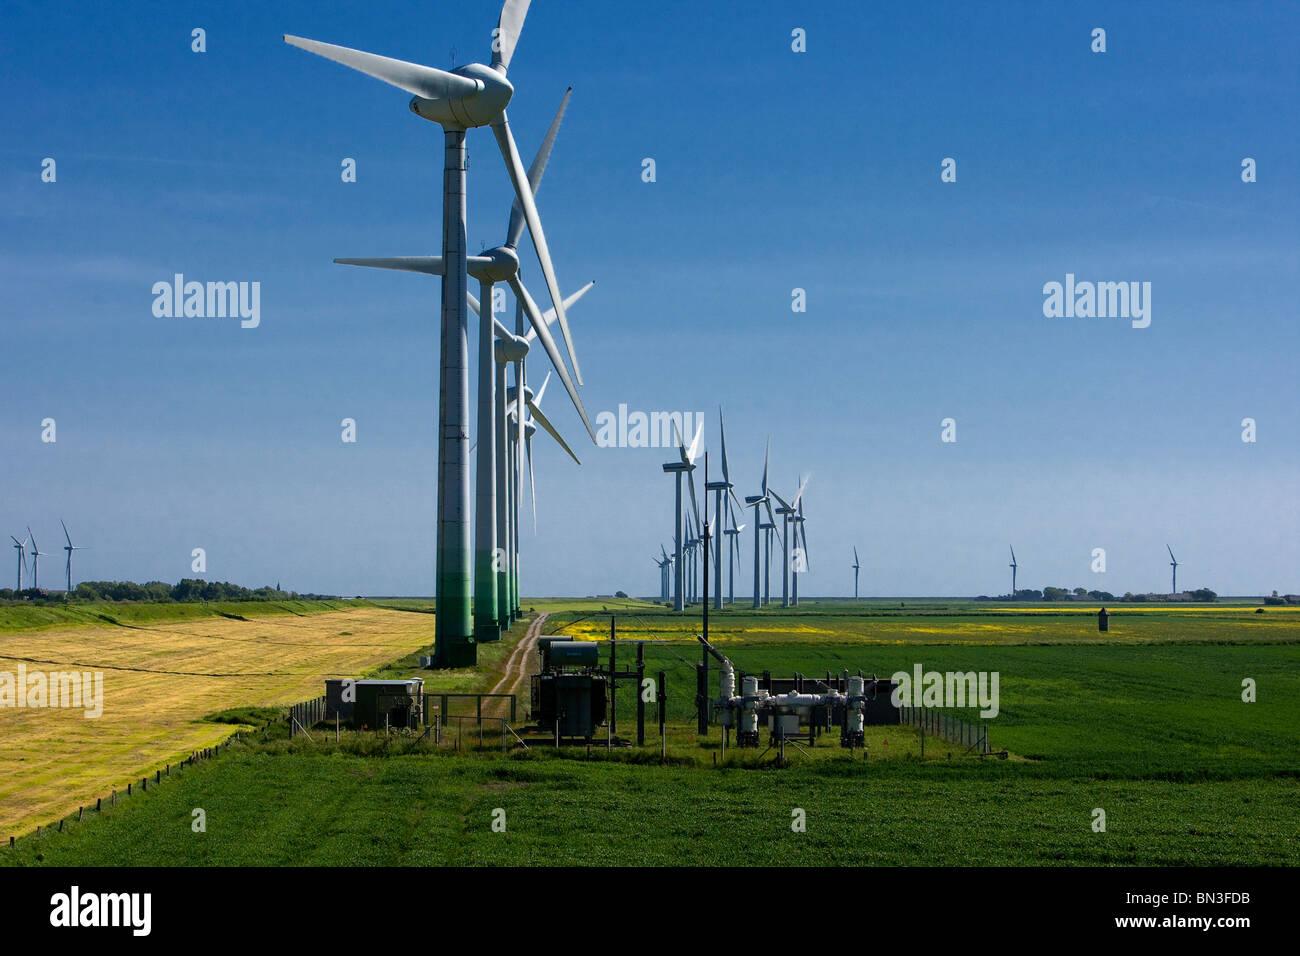 Impianto di energia eolica, Niebuell, Schleswig-Holstein, Germania Immagini Stock